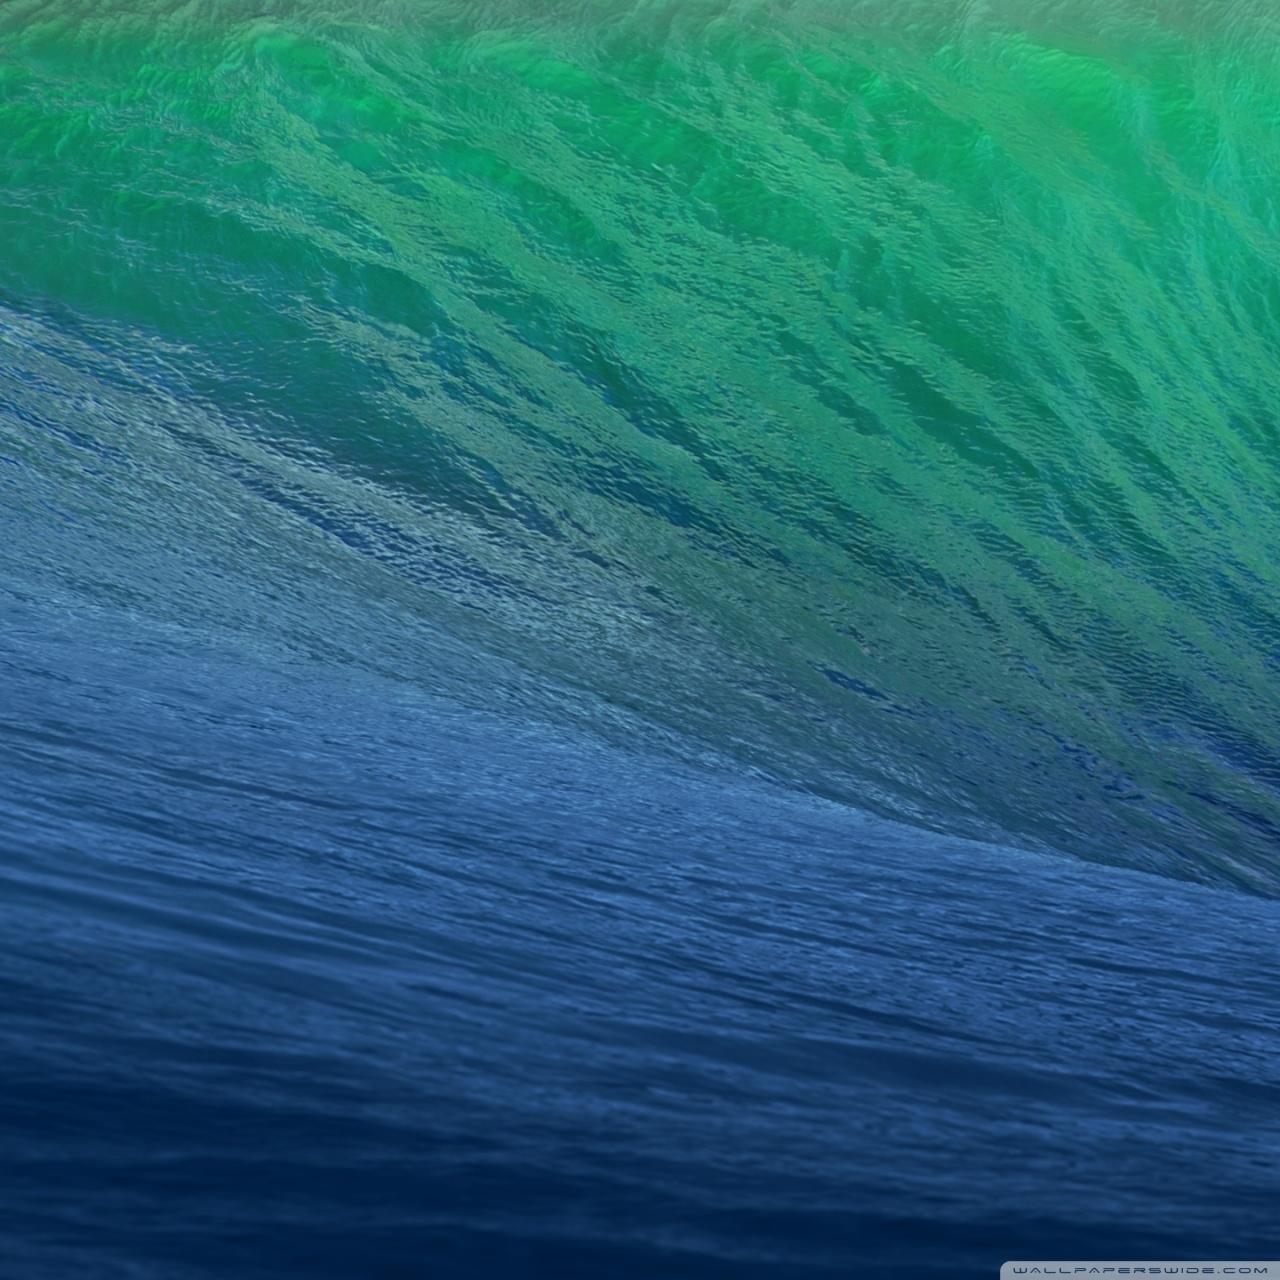 apple mac os x mavericks ❤ 4k hd desktop wallpaper for 4k ultra hd